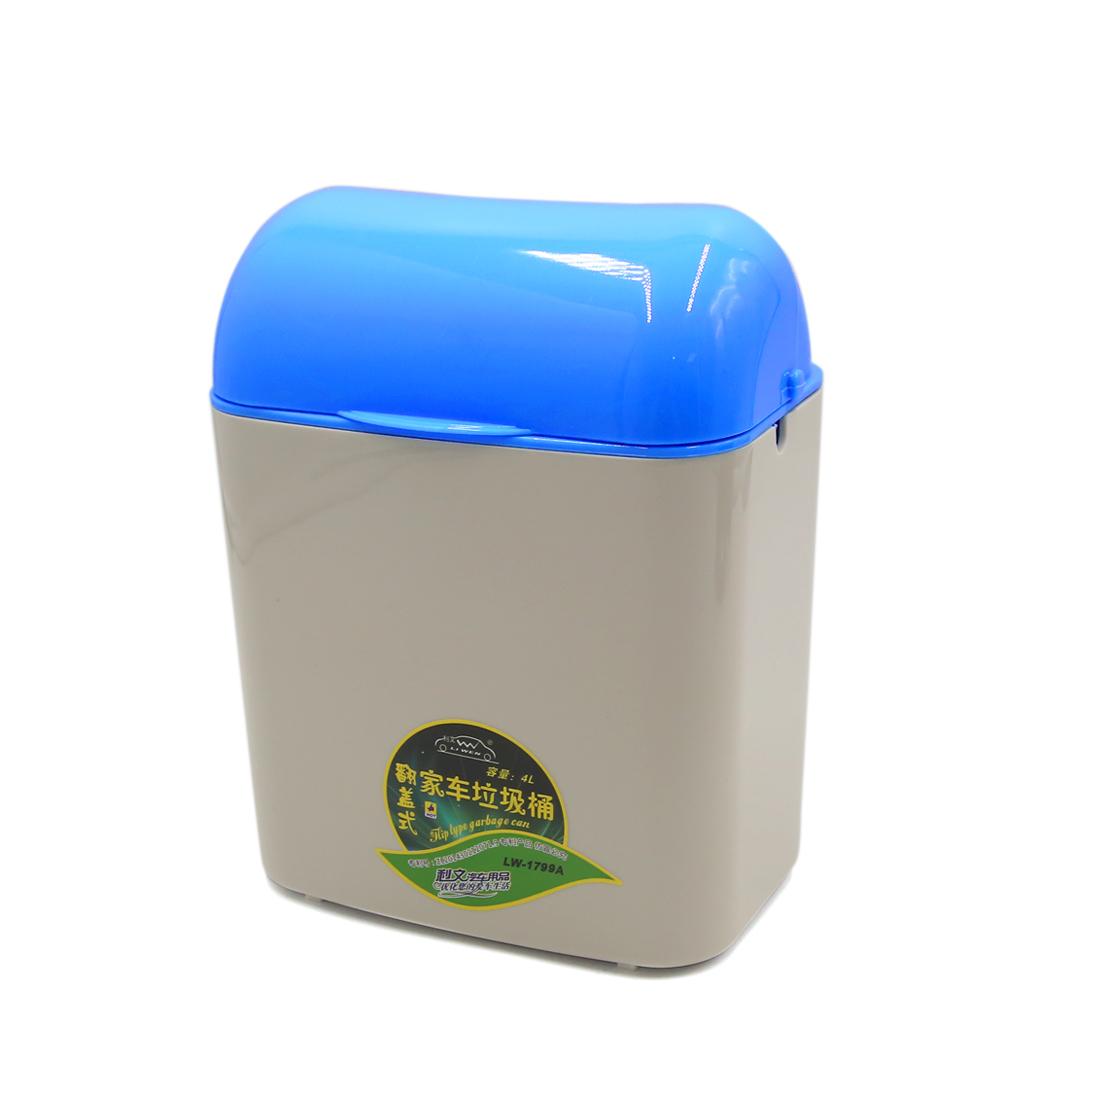 Blue Khaki Plastic Rubbish Trash Bin Car Home Garbage Dustbin Box Case Holder